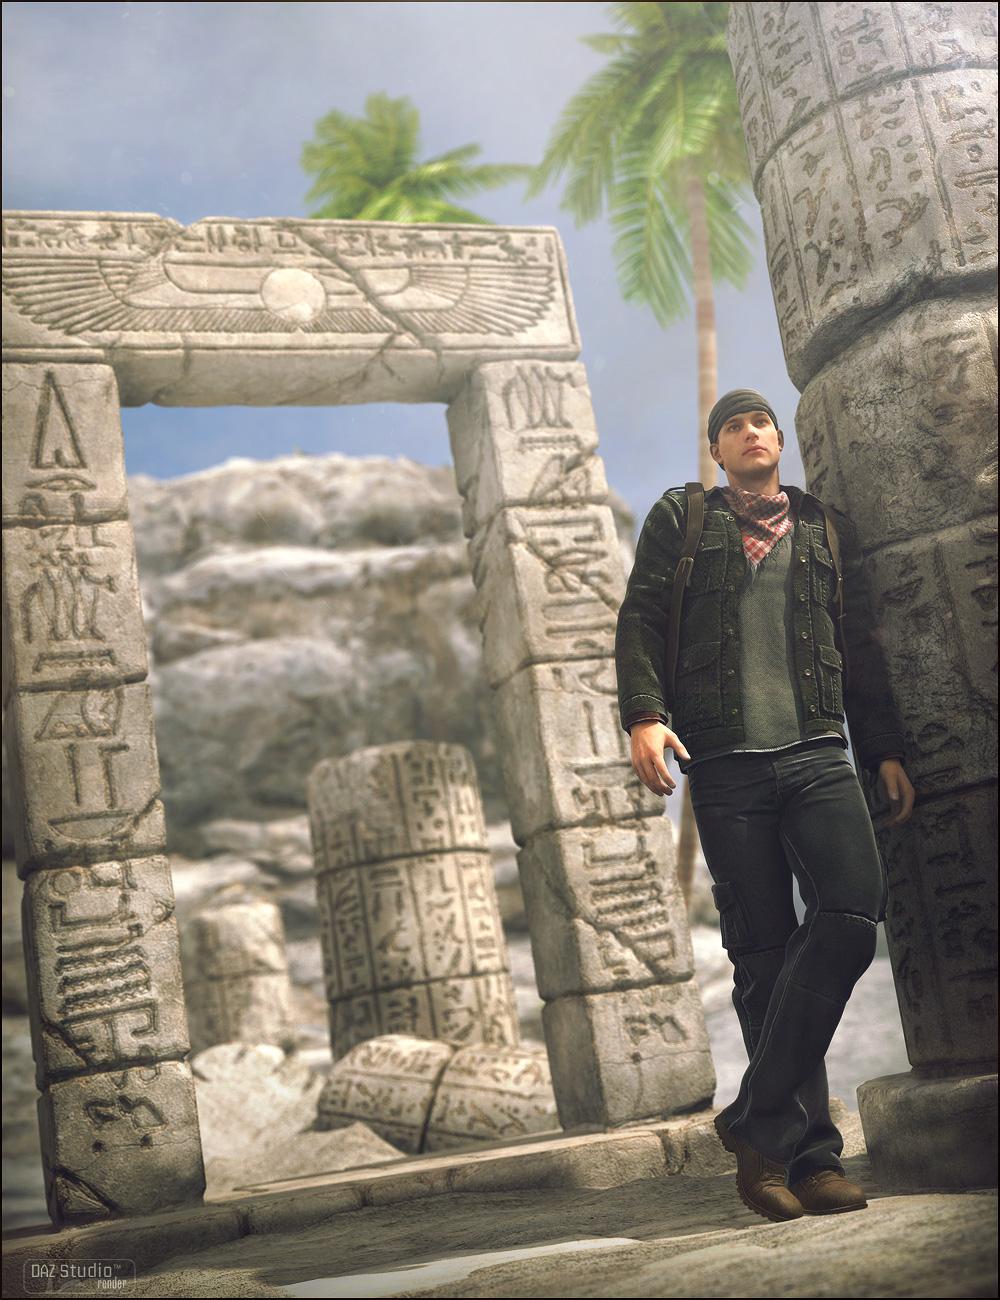 Ruins Of Egypt 01 by: Stonemason, 3D Models by Daz 3D